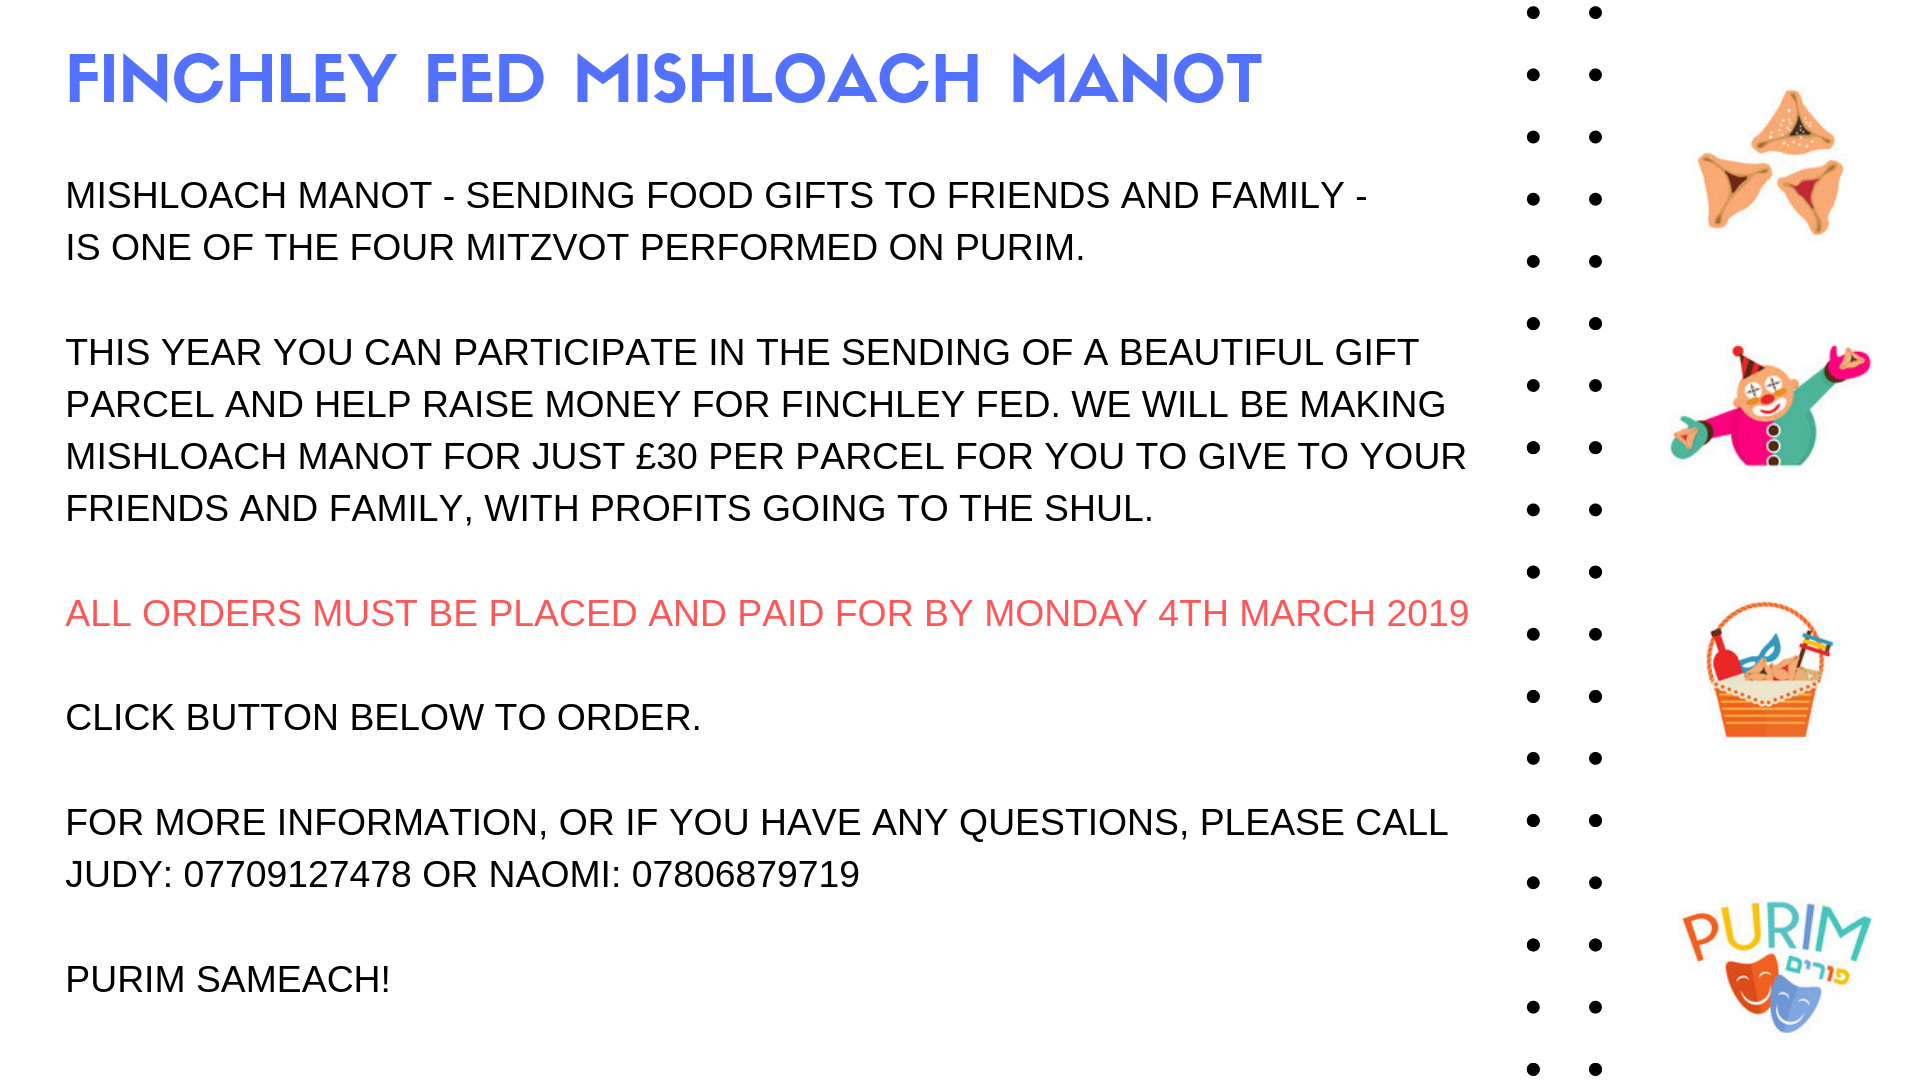 Web_Finchley fed mishloach manot.png